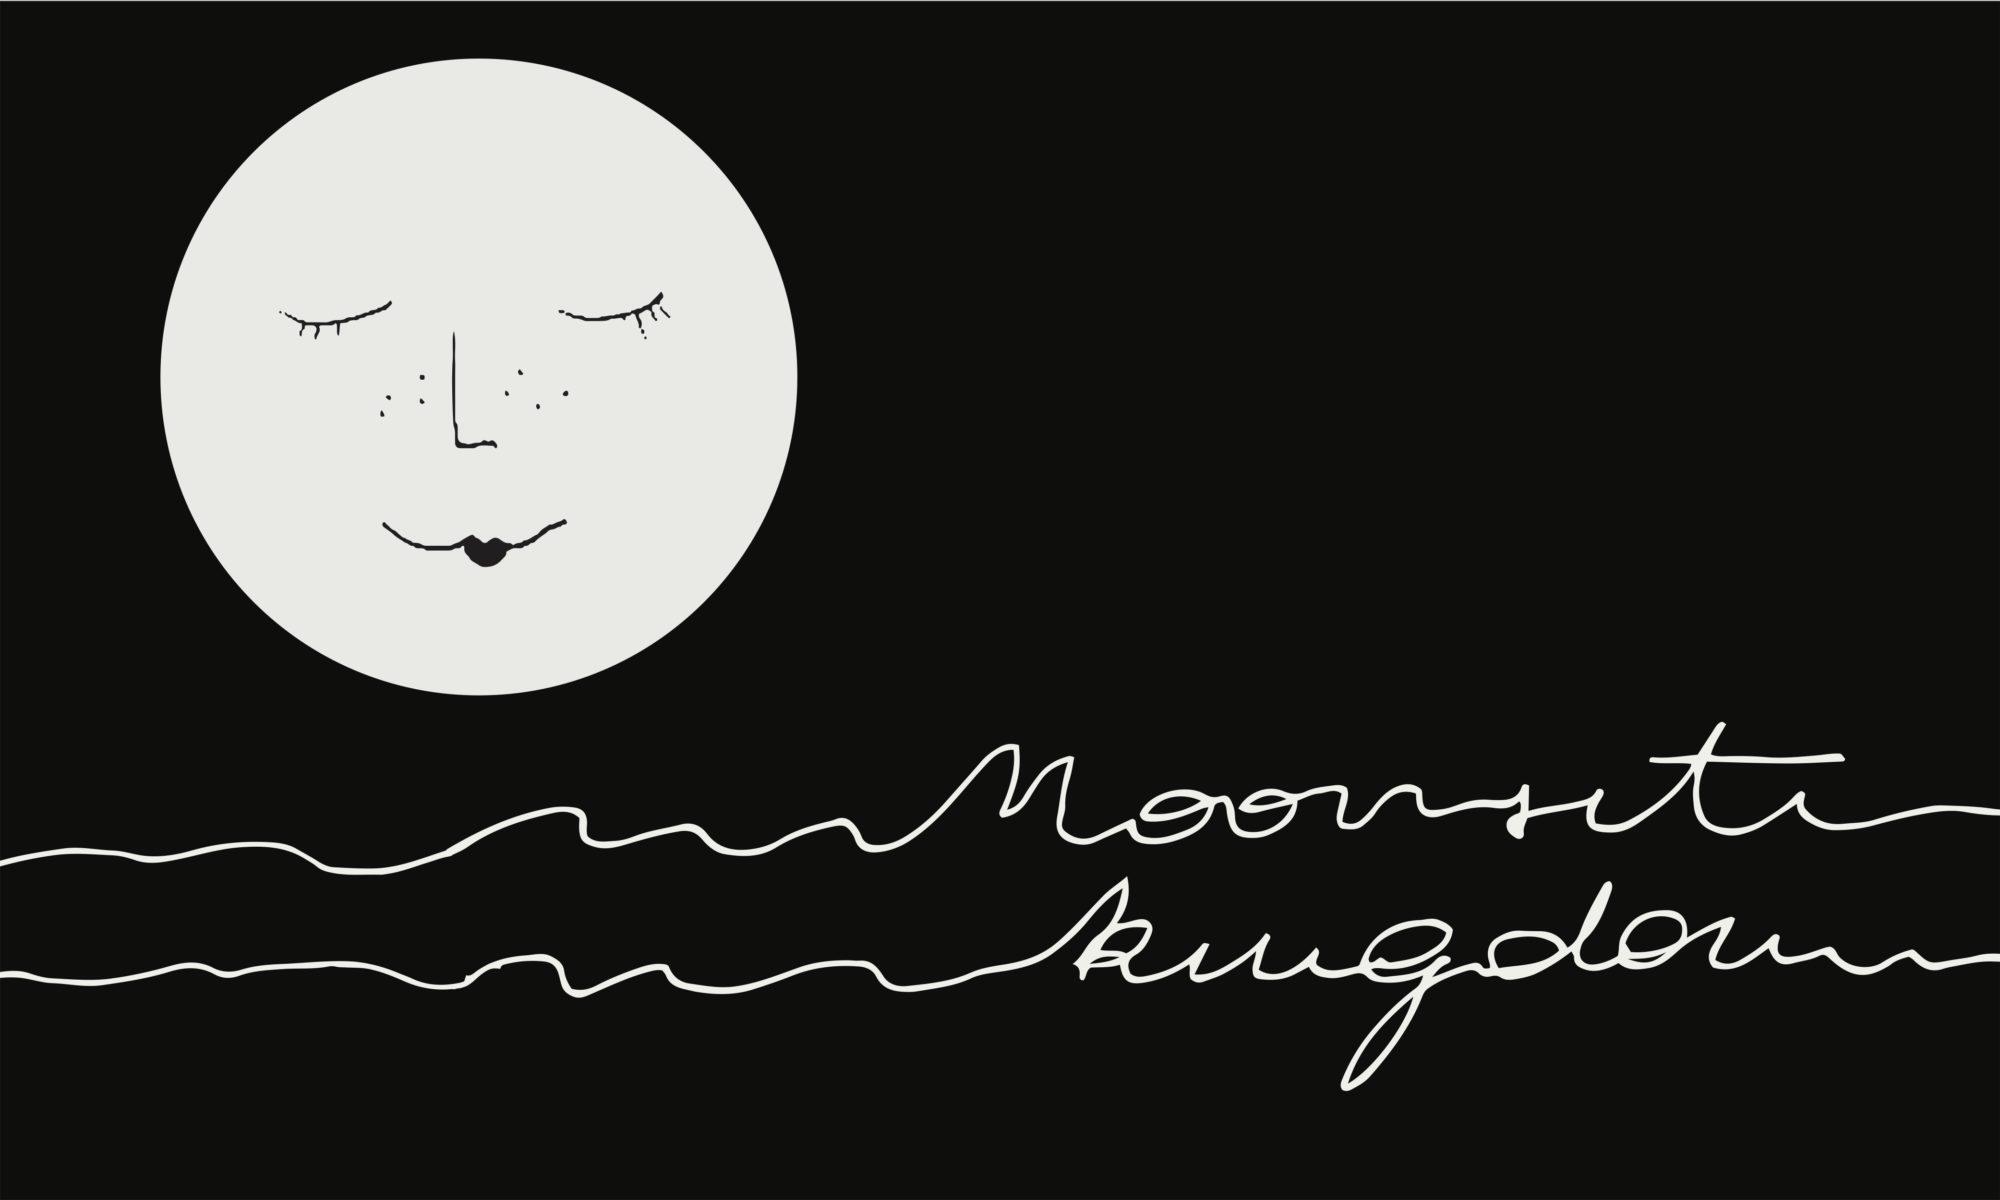 MOONSET KINGDOM